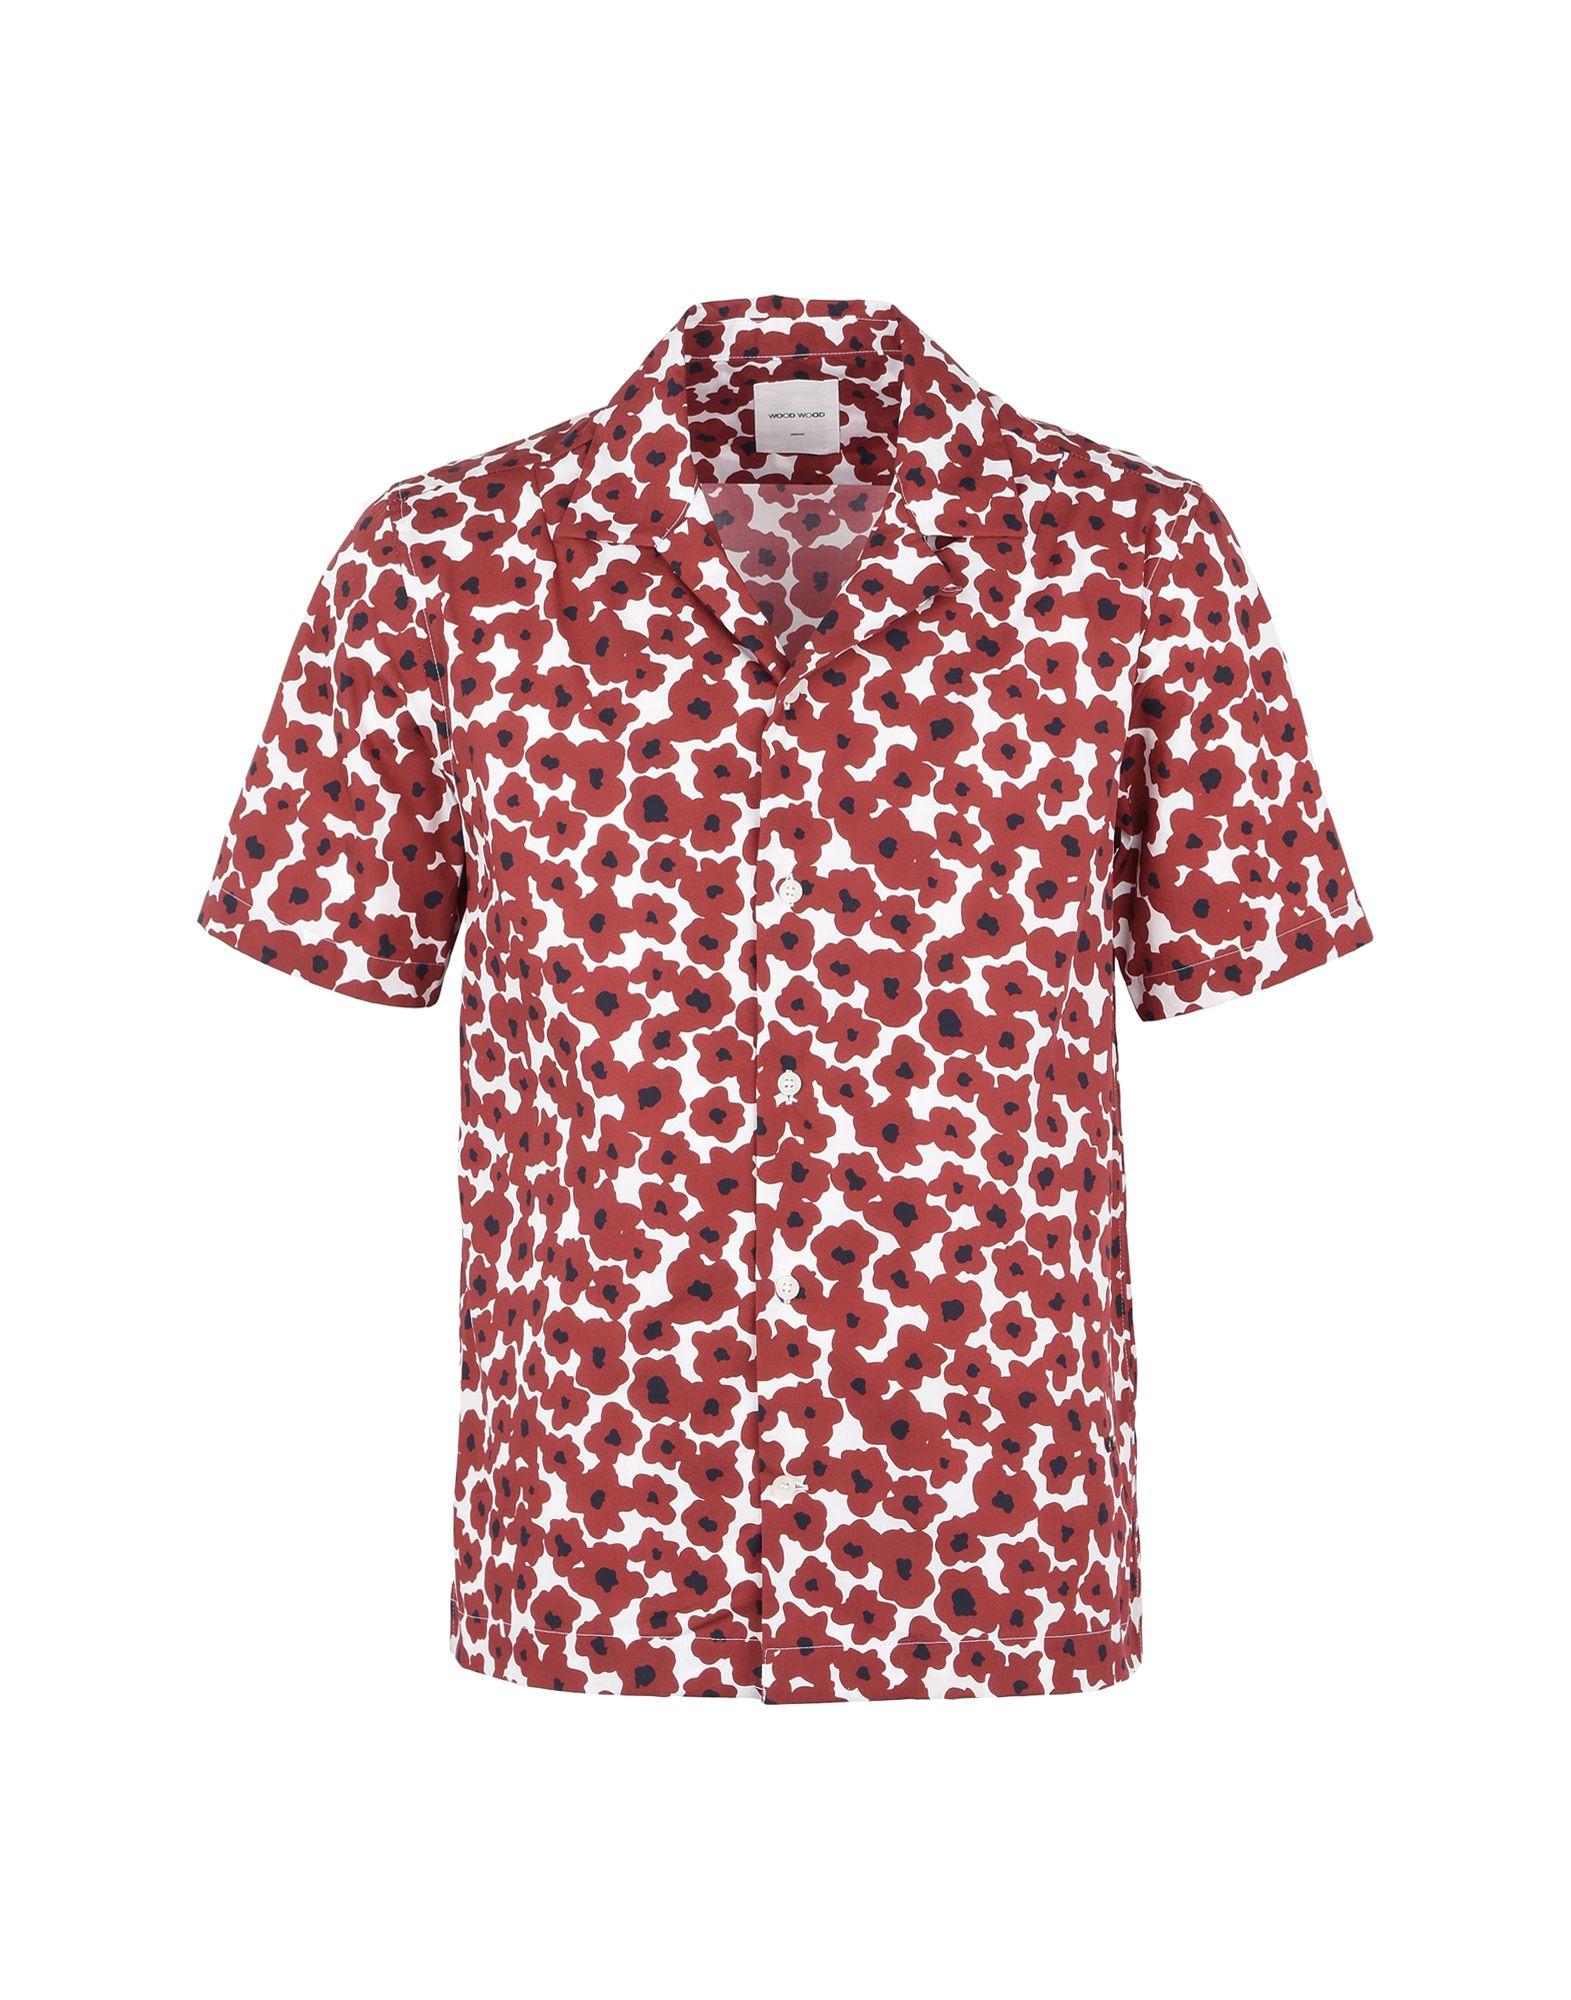 Camicia Fantasia Wood Wood Brandon Shirt Mens Woven Shirt - Uomo - Acquista online su